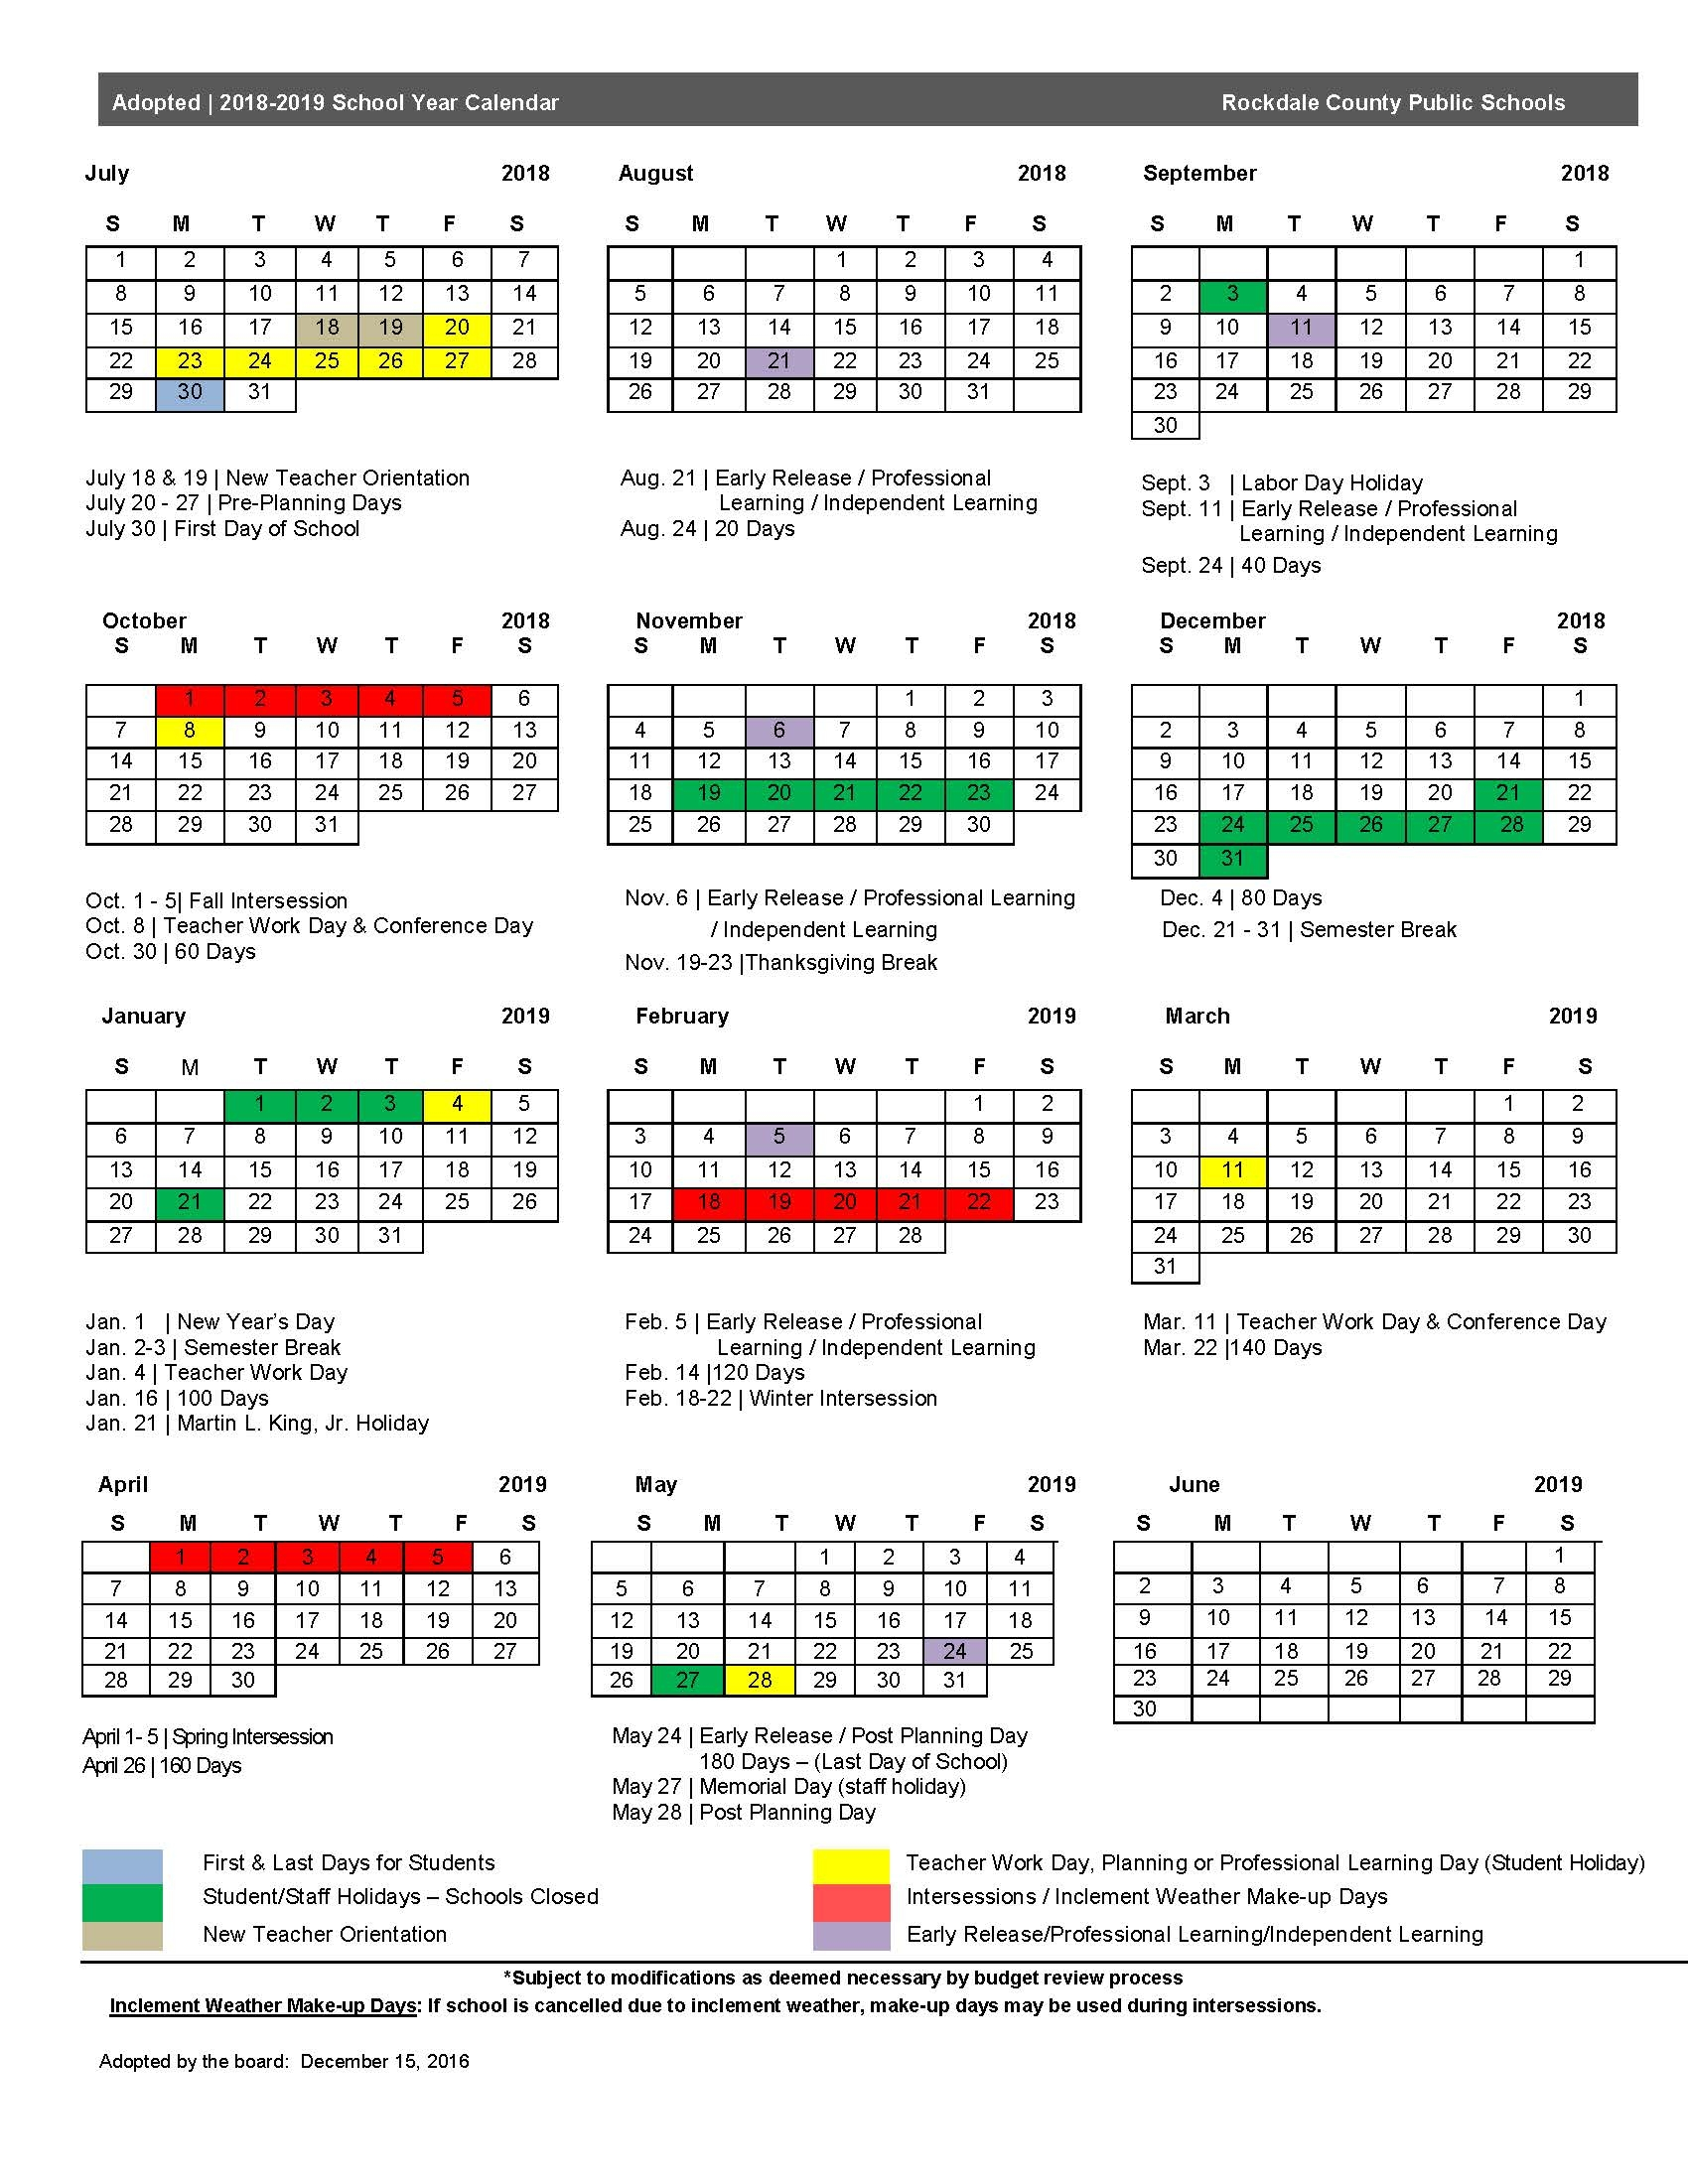 Rockdale County School Calendar